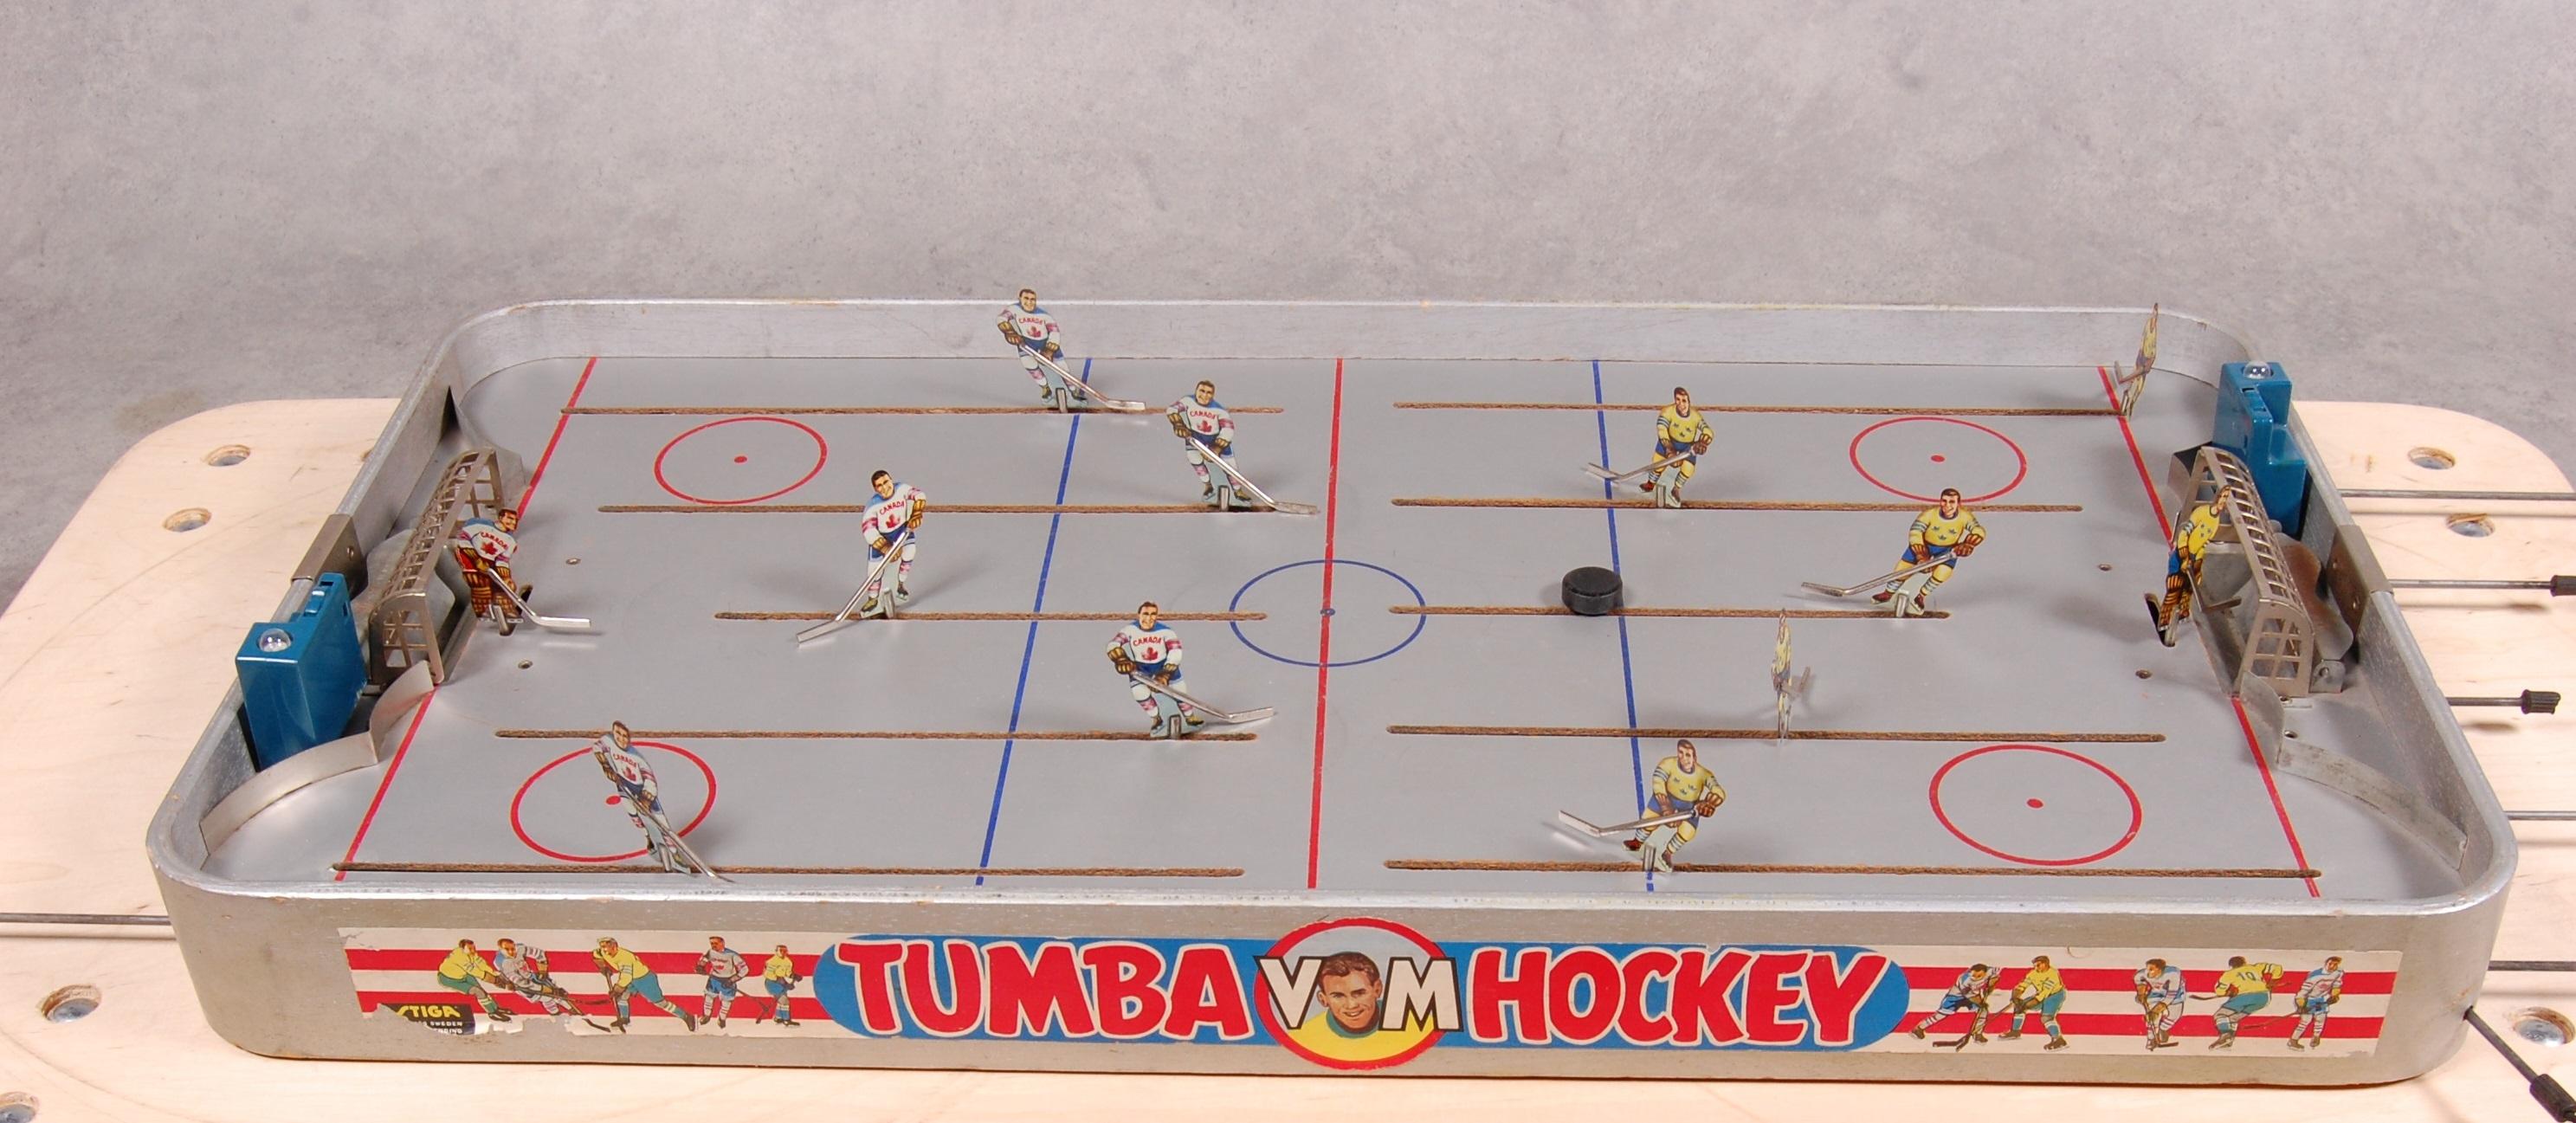 Vintage table hockey - Stiga Vintage Table Hockey Tumba Vm Hockey Game 1958